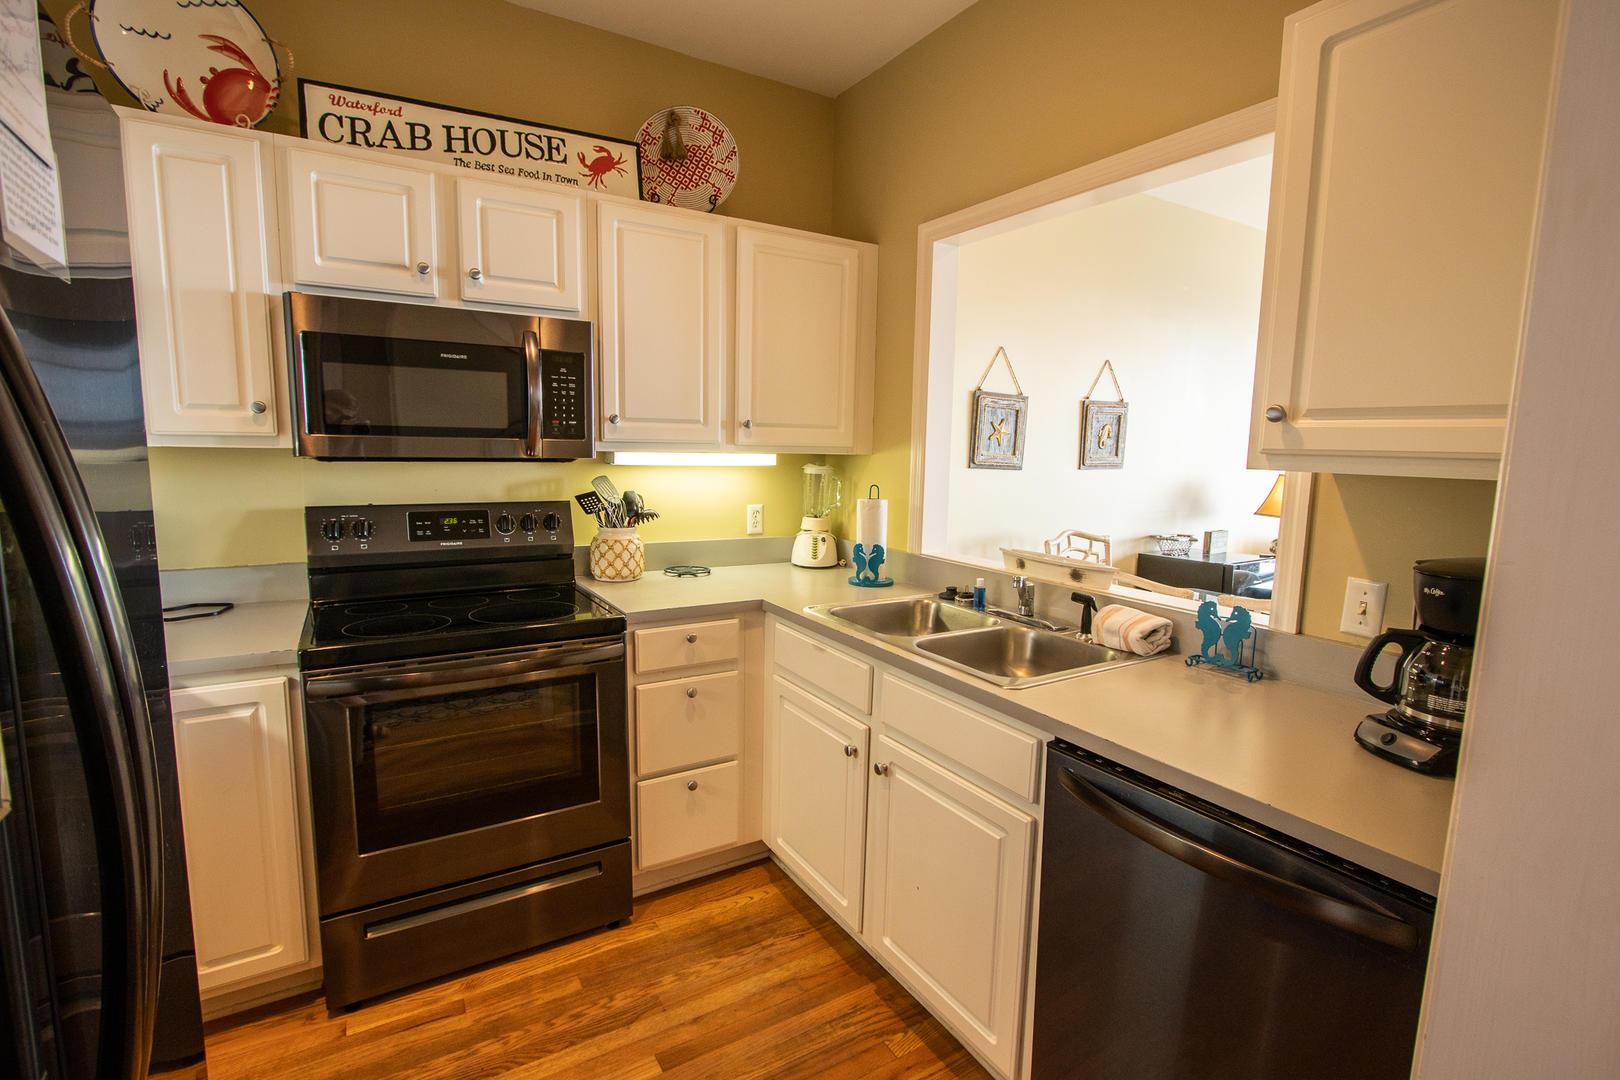 Kitchen, coffee pot, keurig